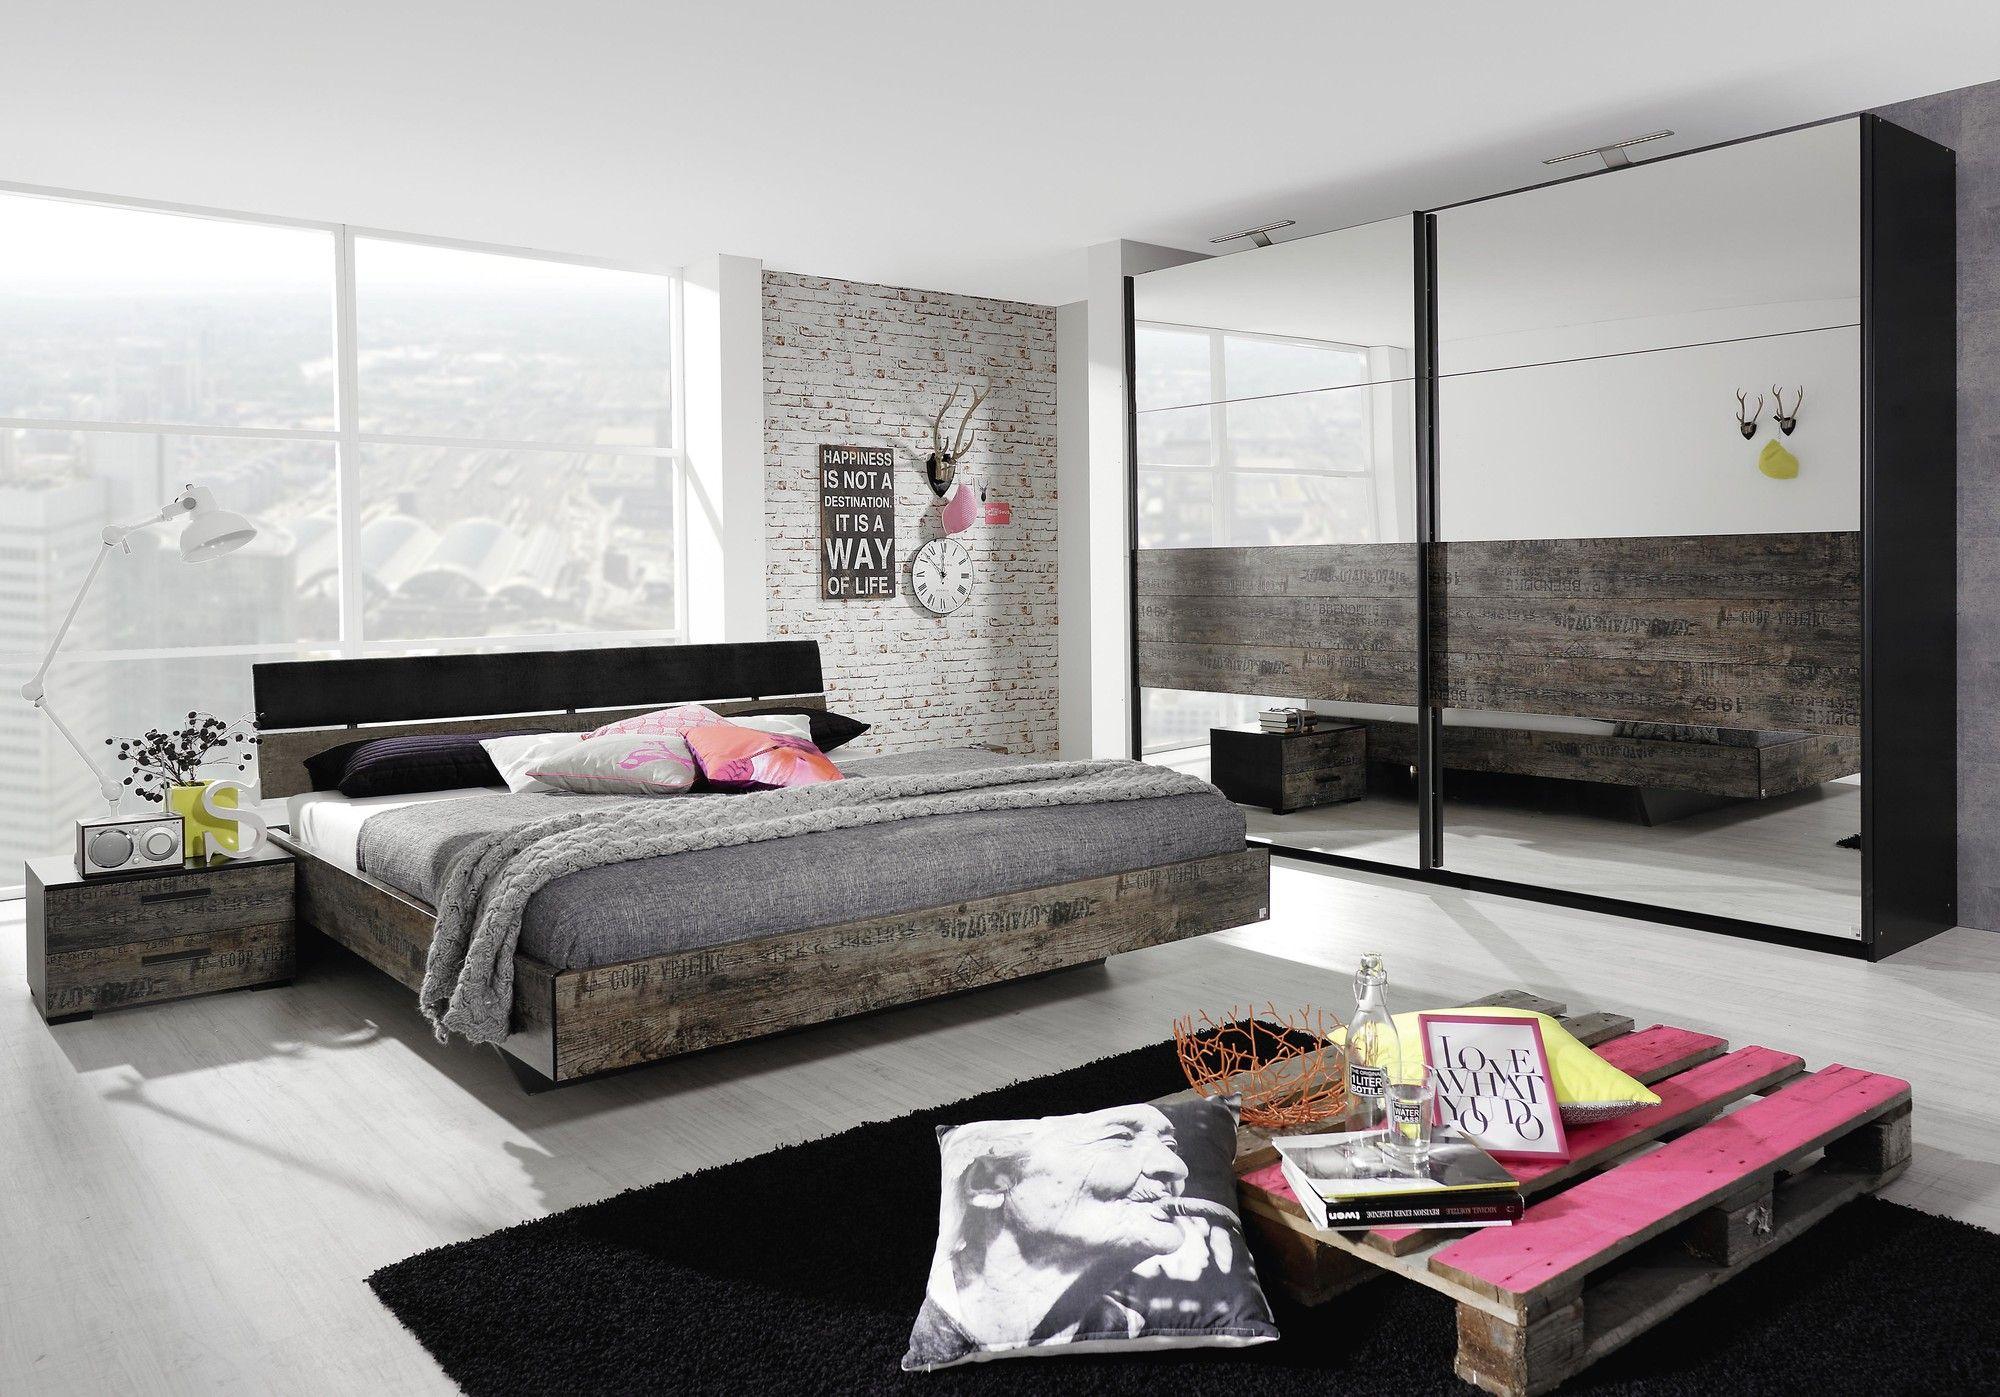 Futonbett Sumatra Wayfair.de Bedroom set, Furniture, Decor